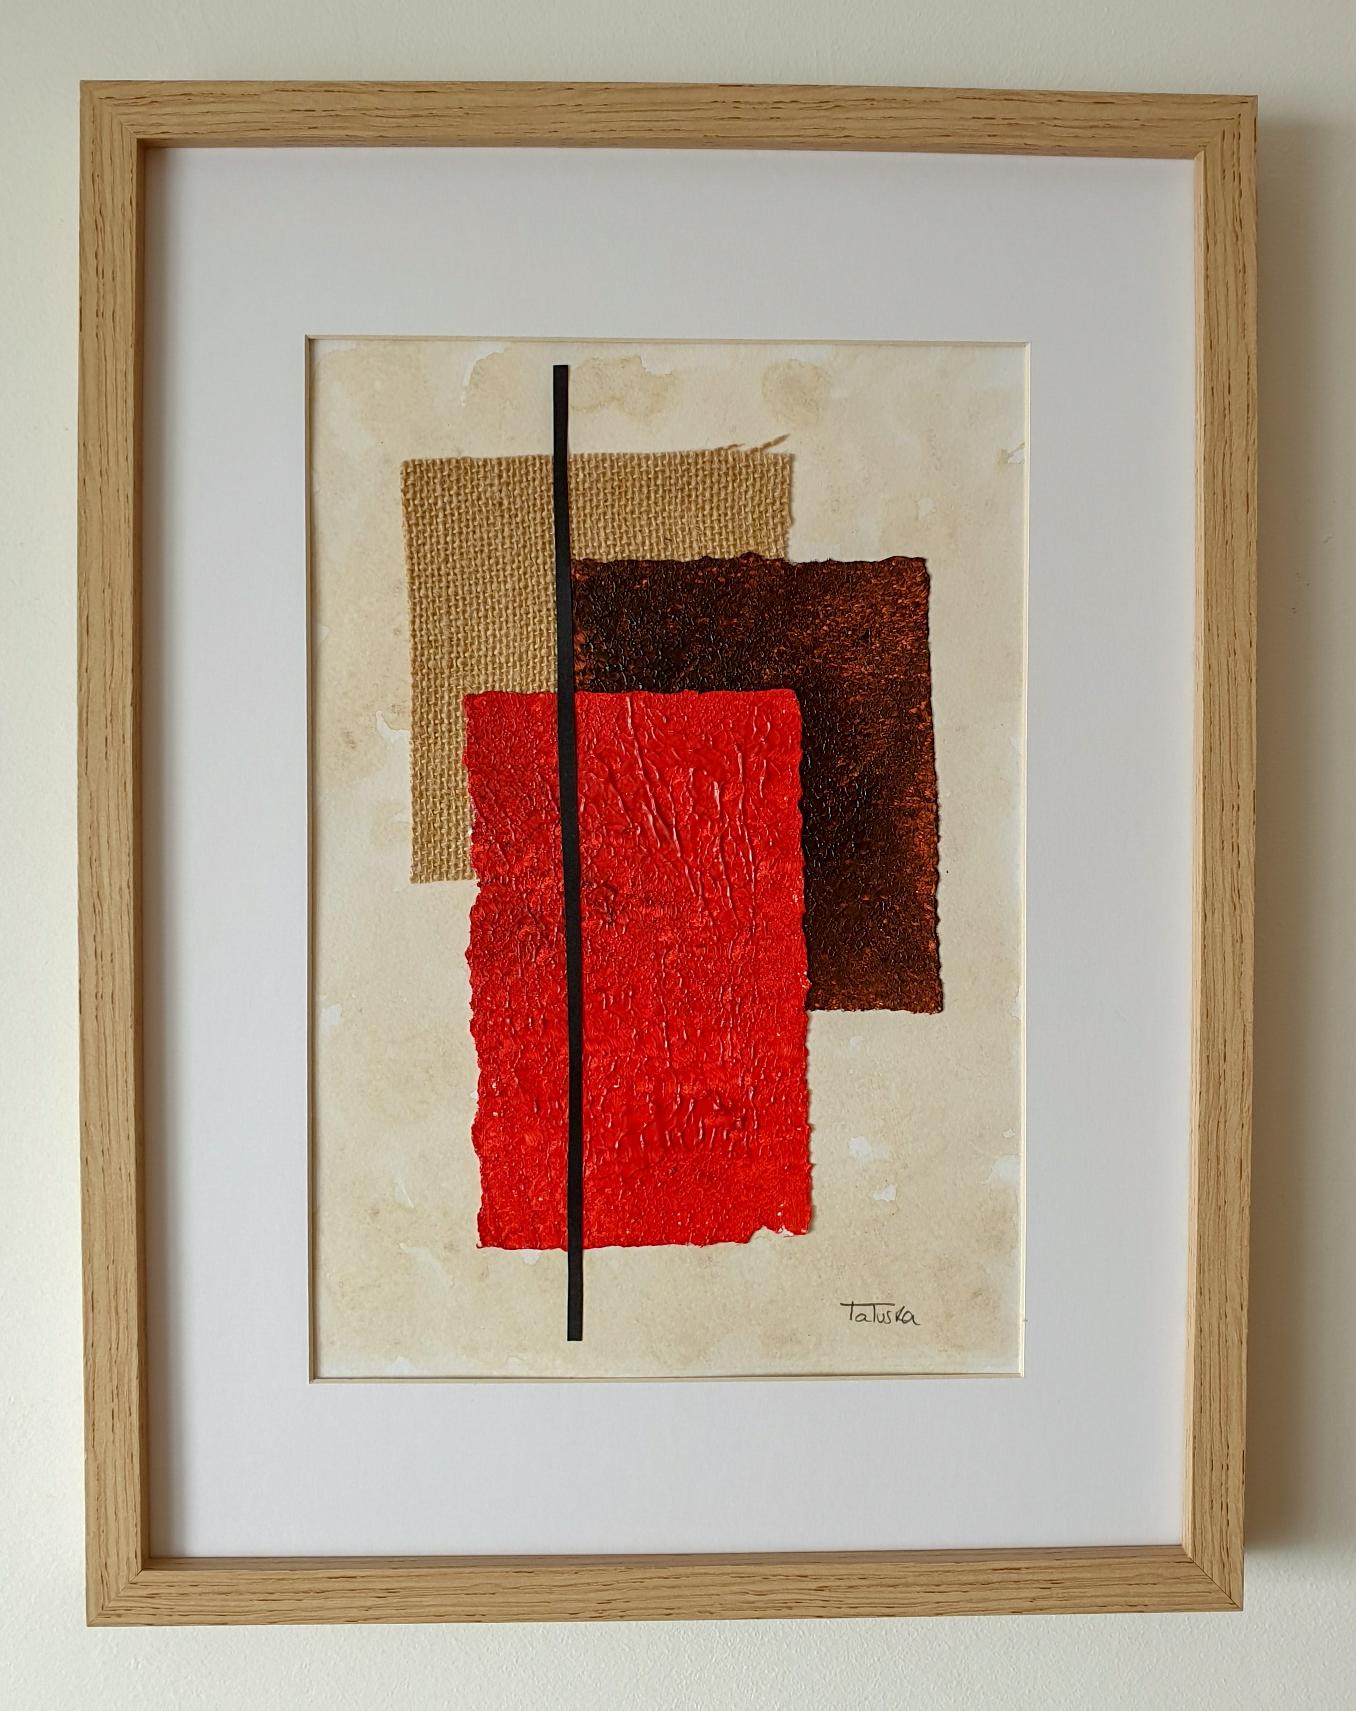 "Cuadro de arte abstracto titulado ""A little bit of chaos"" de la artista Tatuska (https://artuska.com)"